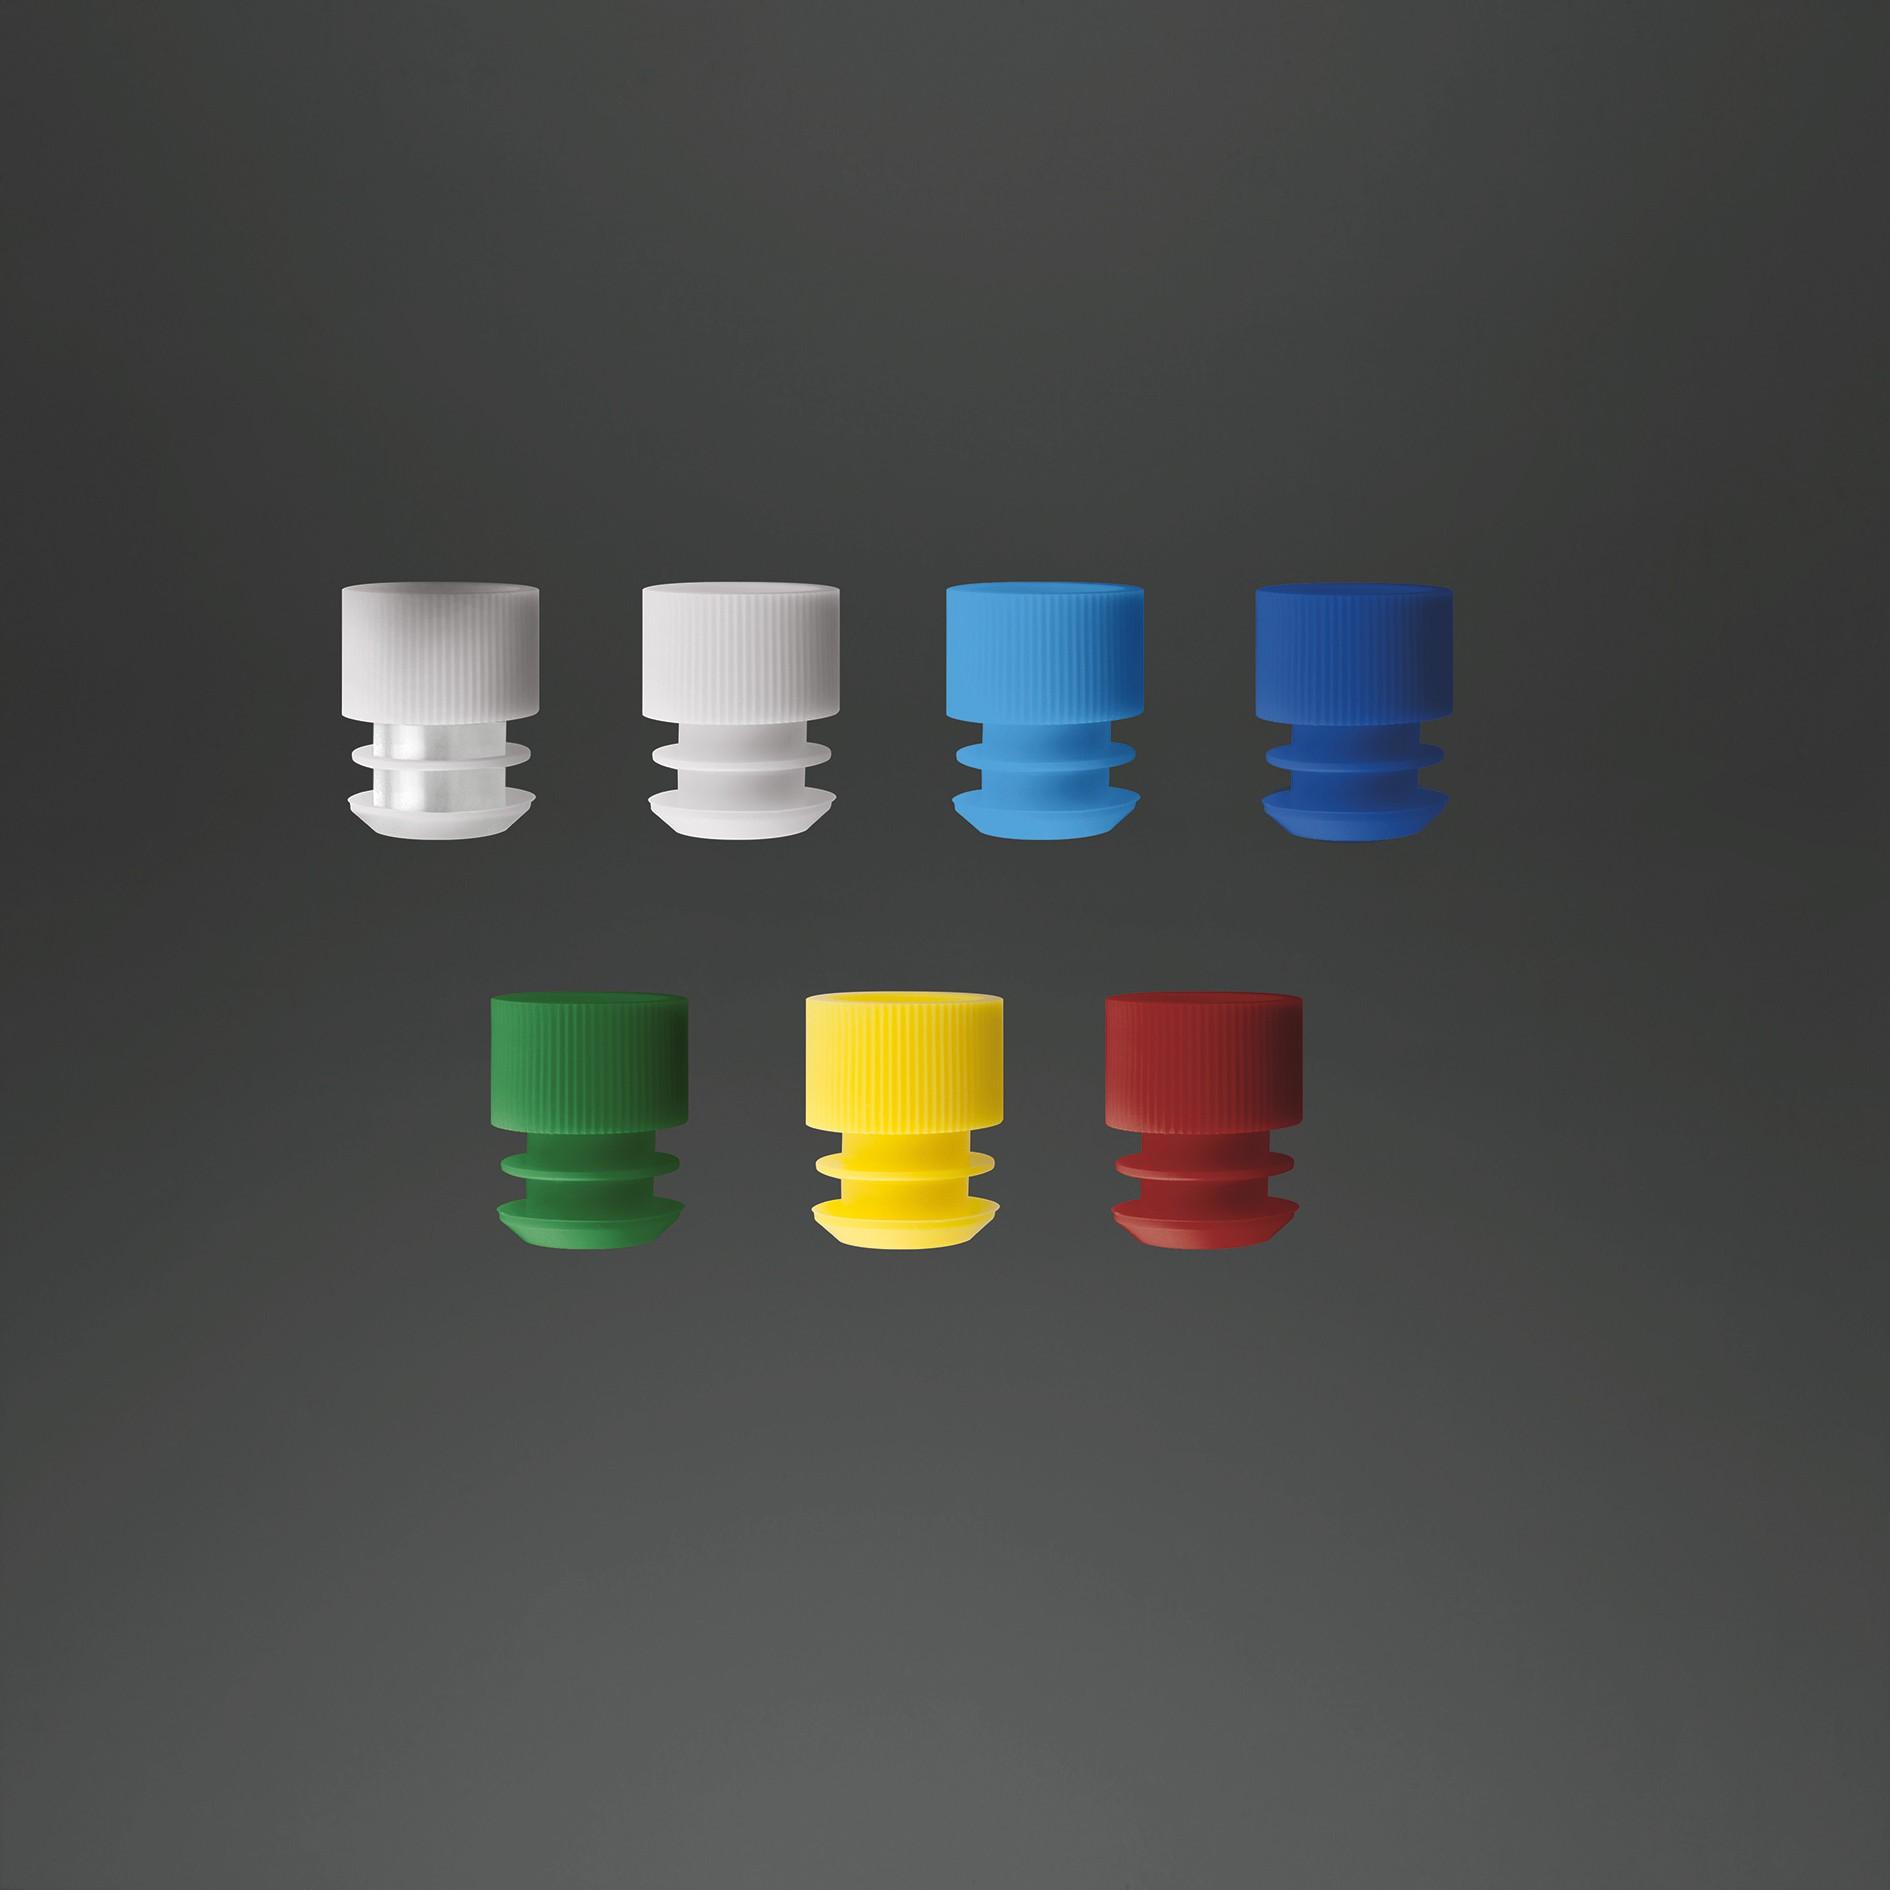 Charmant Eine Neutrale Drahtfarbe Galerie - Schaltplan Serie Circuit ...